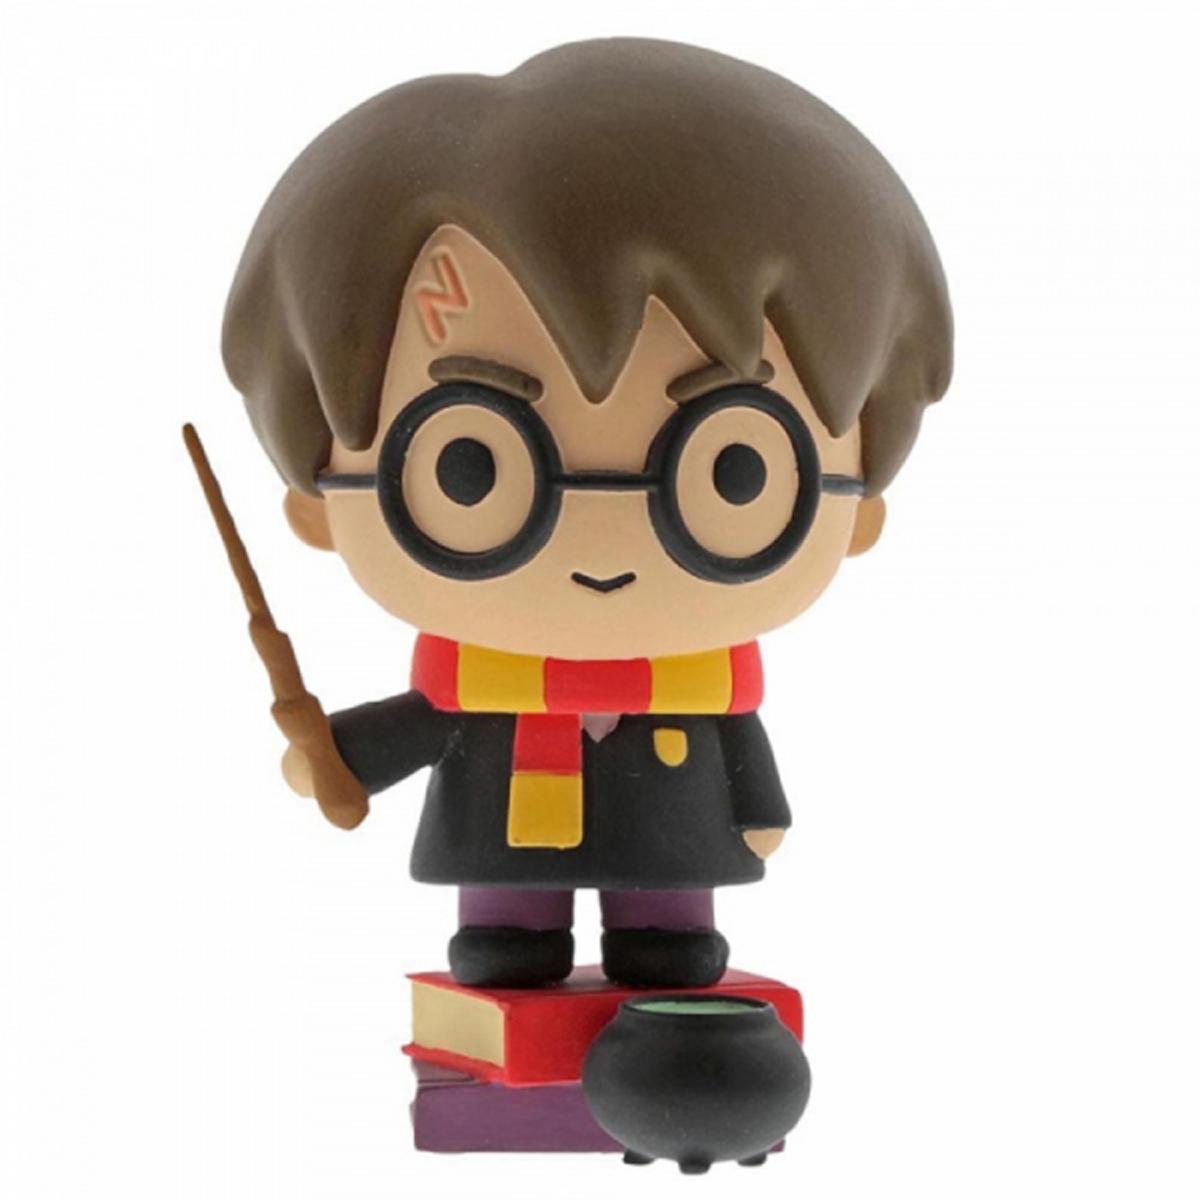 Figurine résine \'Harry Potter\' chibi style - 85x55x50 mm - [R2035]